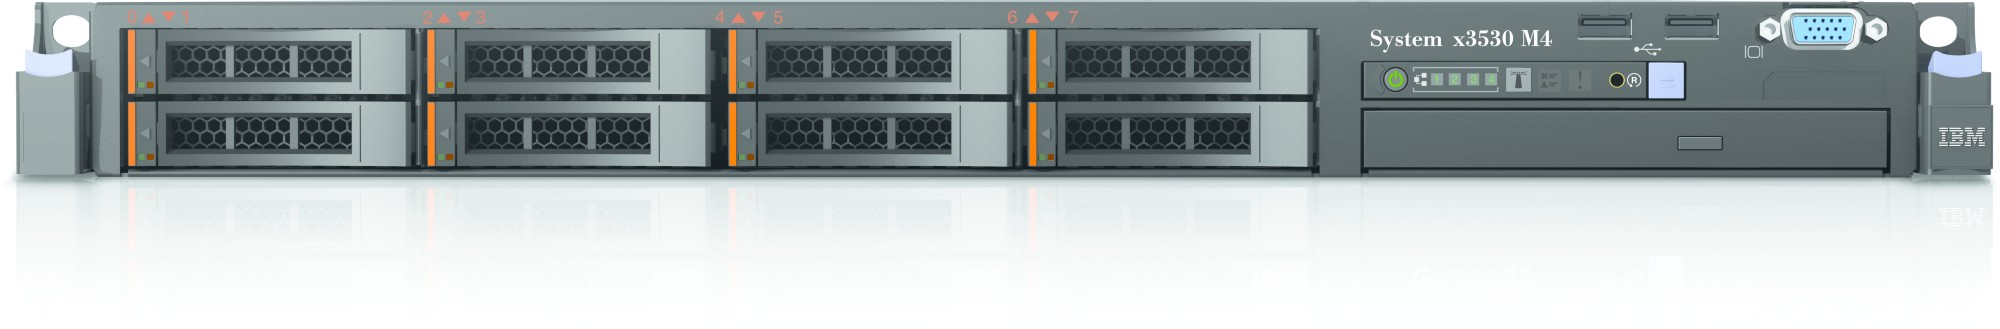 IBM System x 3530 M4 1.9GHz E5-2420 460W Rack (2U) server